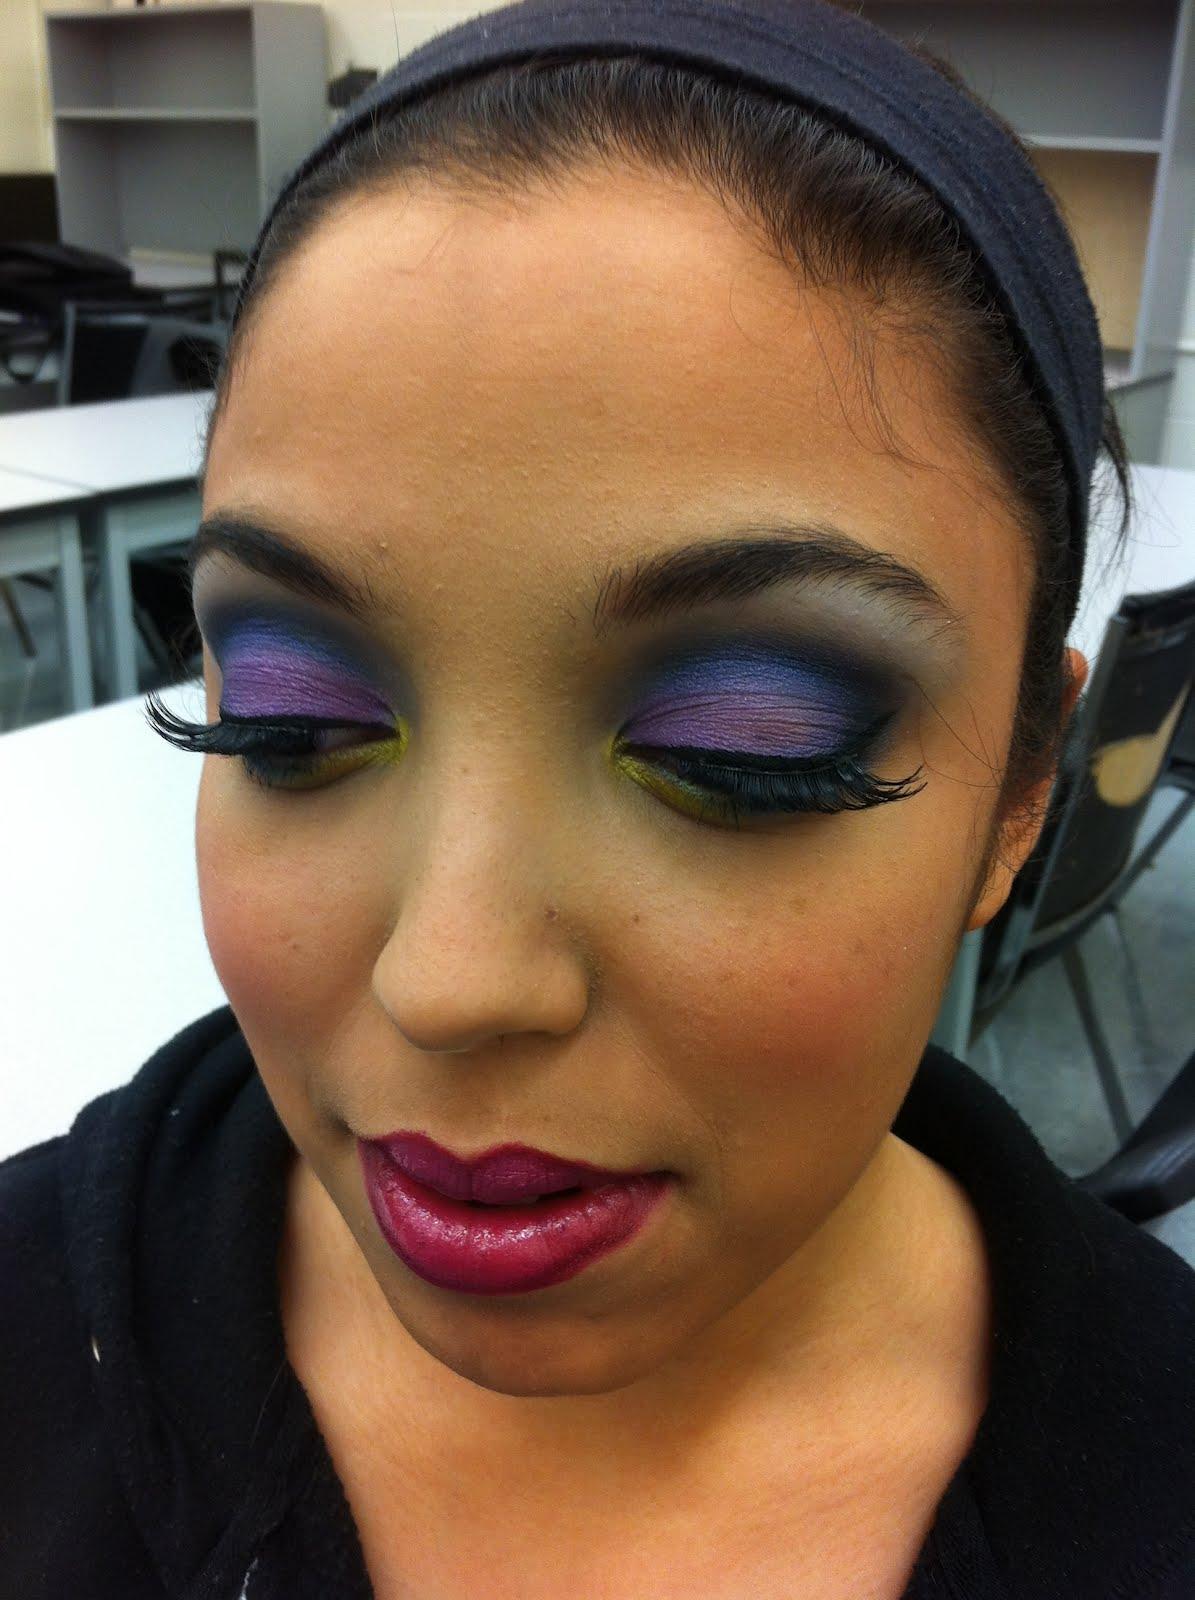 Glamour Makeup: MakeupByMelanie: Glamorous Colorful Makeup Look